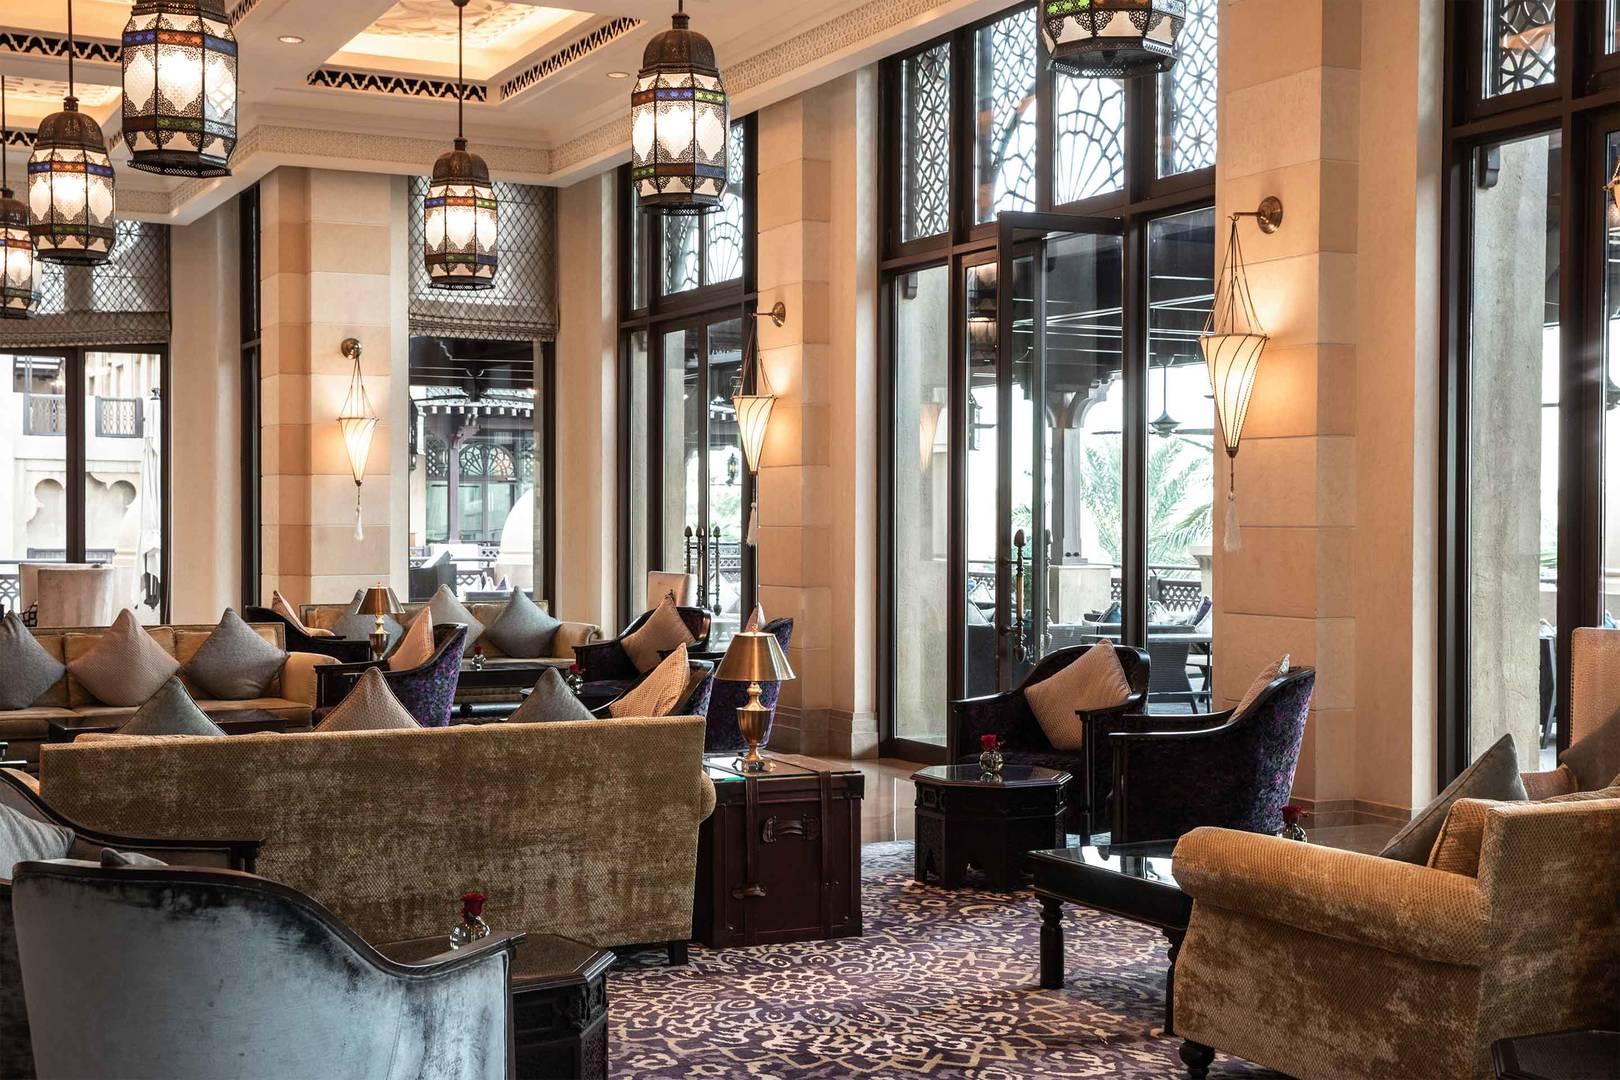 https://cdn.jumeirah.com/-/mediadh/DH/Hospitality/Jumeirah/Restaurants/Dubai/Mina-A-Salam-Al-Samar-Lounge/Restaurant-Gallery/6-4-Gallery_Jumeirah-Mina-A-Salam-Al-Samar-Lounge-5.jpg?h=1080&w=1620&hash=DB40D946B4D148F8239ABA141399C86D